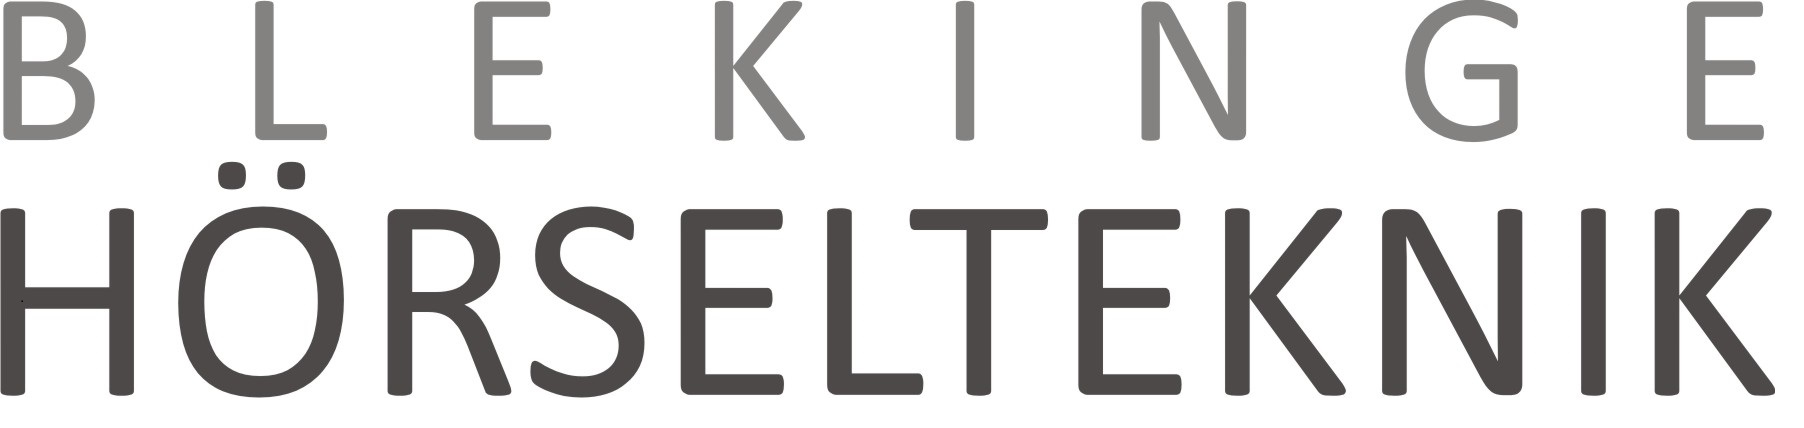 BLEKINGE HÖRSELTEKNIK